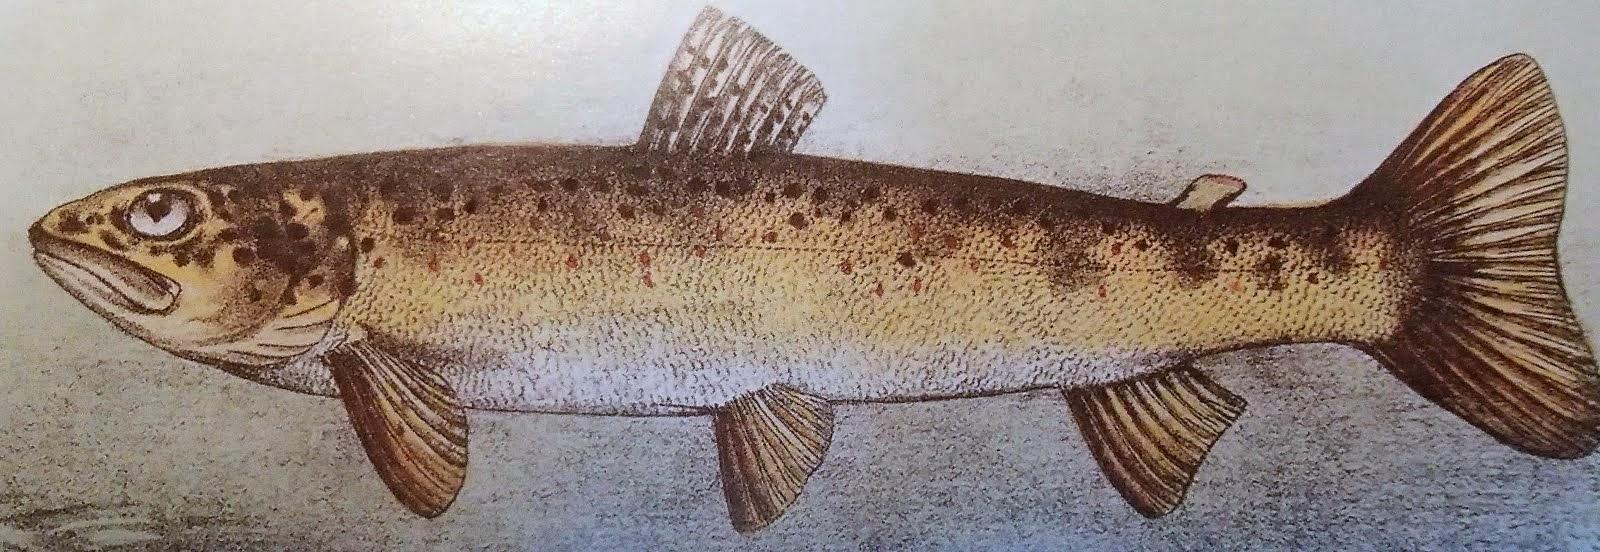 Fario, (Dictionnaire des Pêches...)